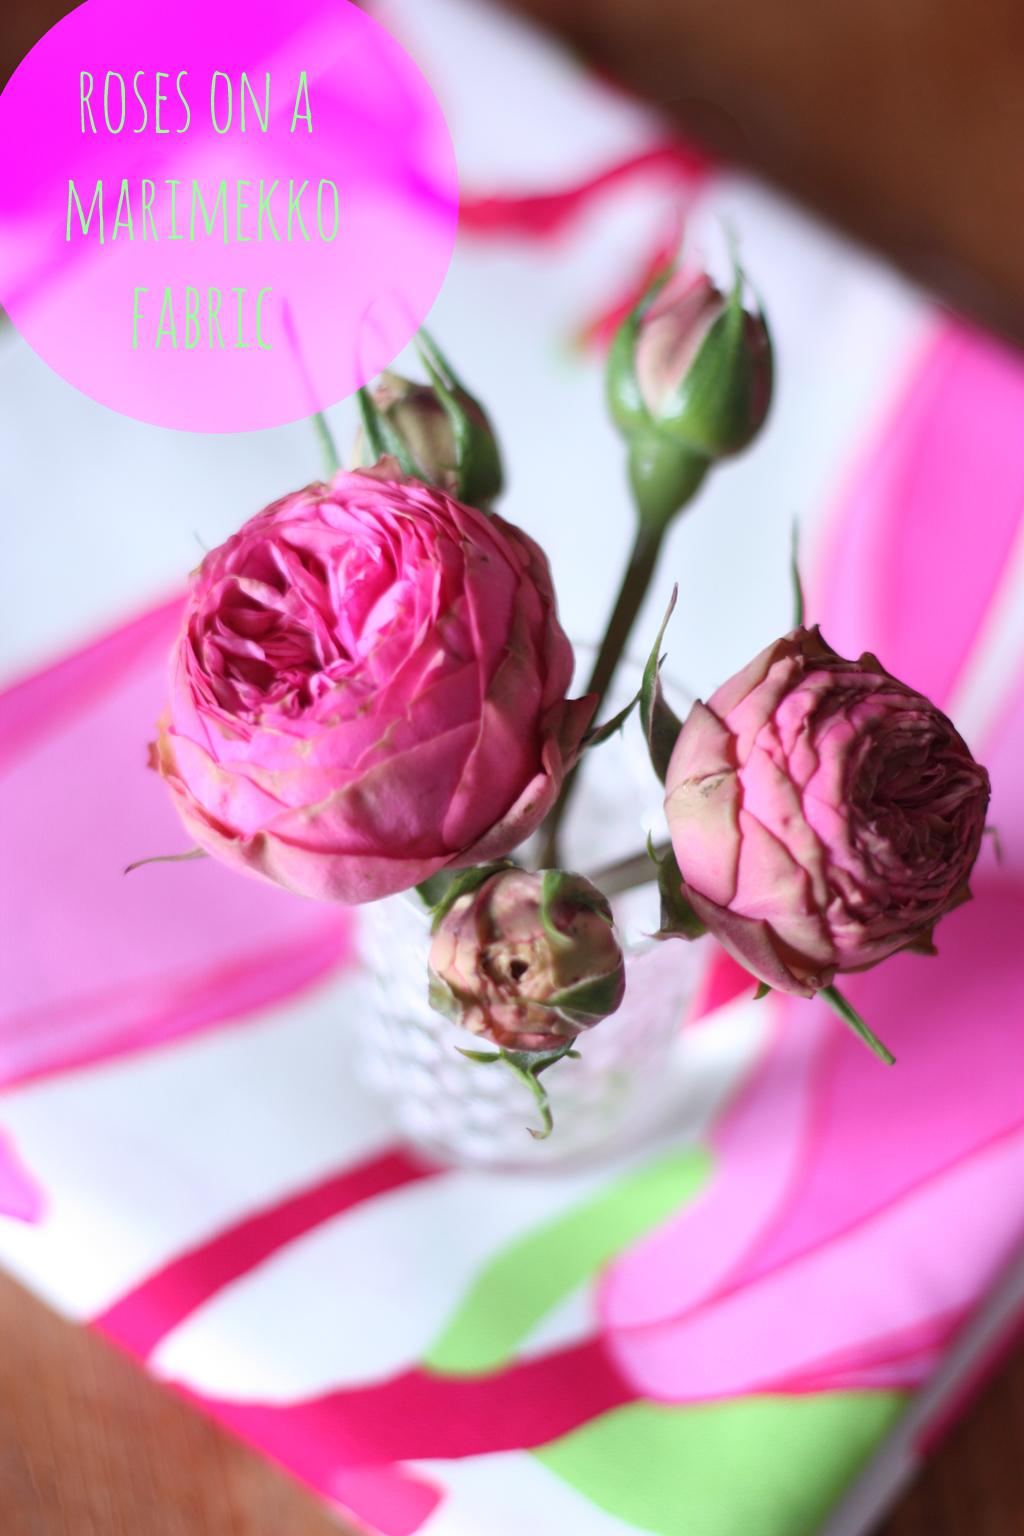 roses on a marimekko fabric